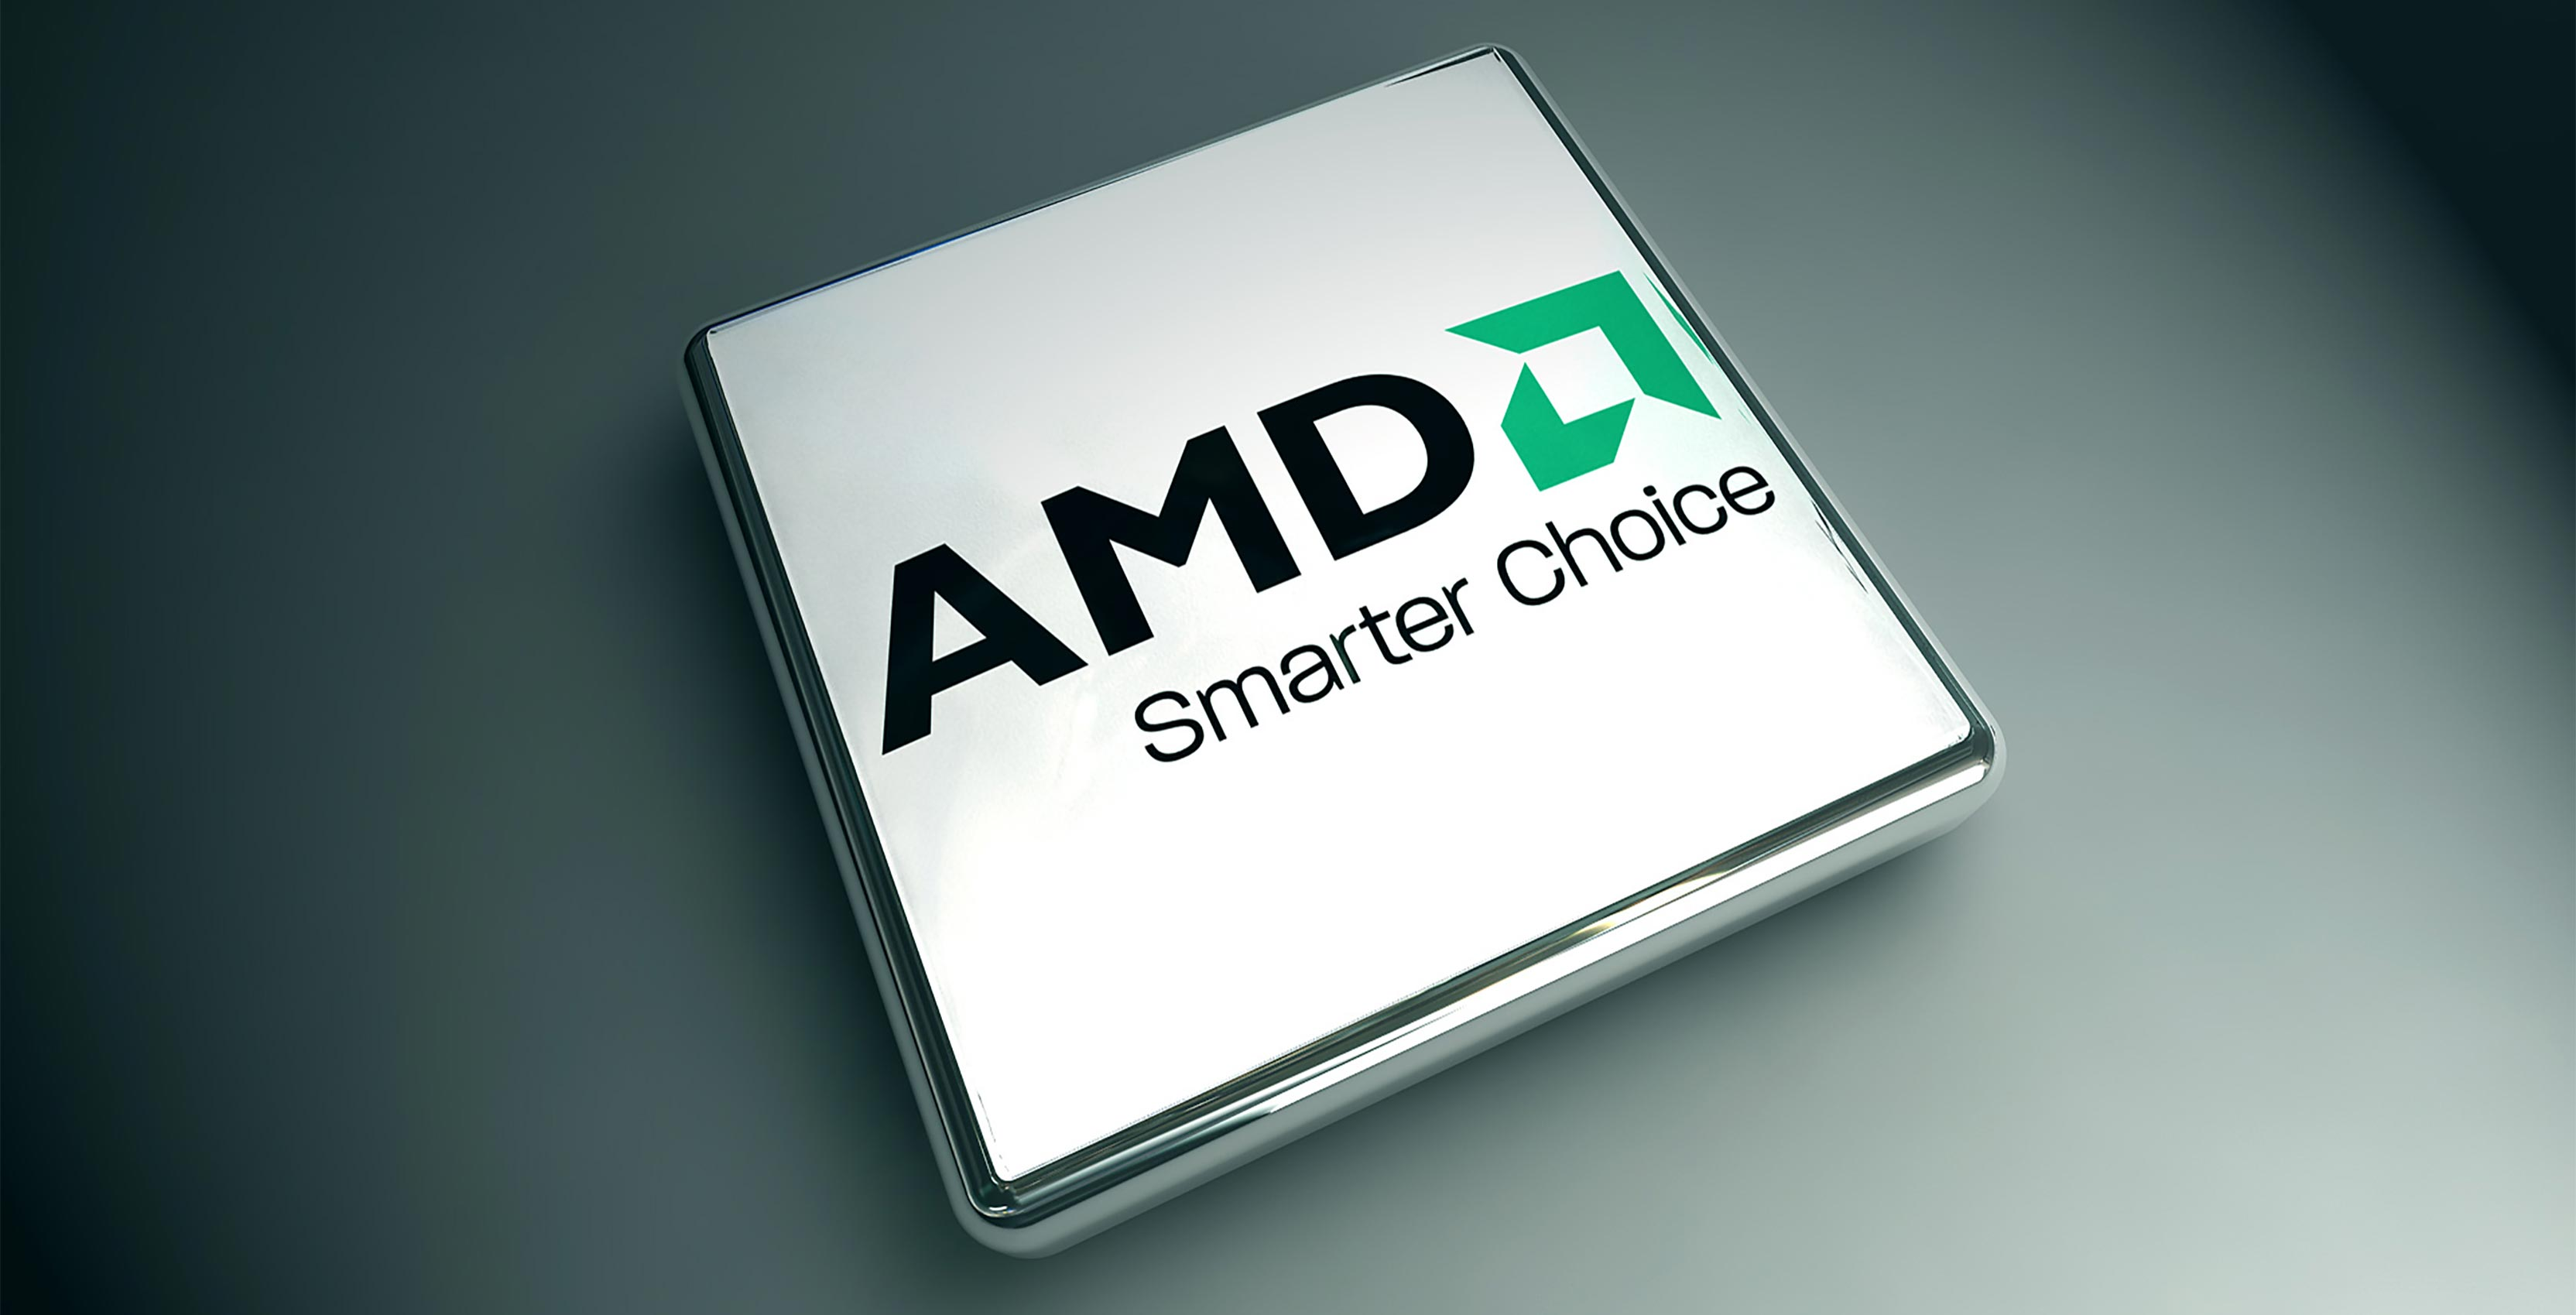 AMD stock image